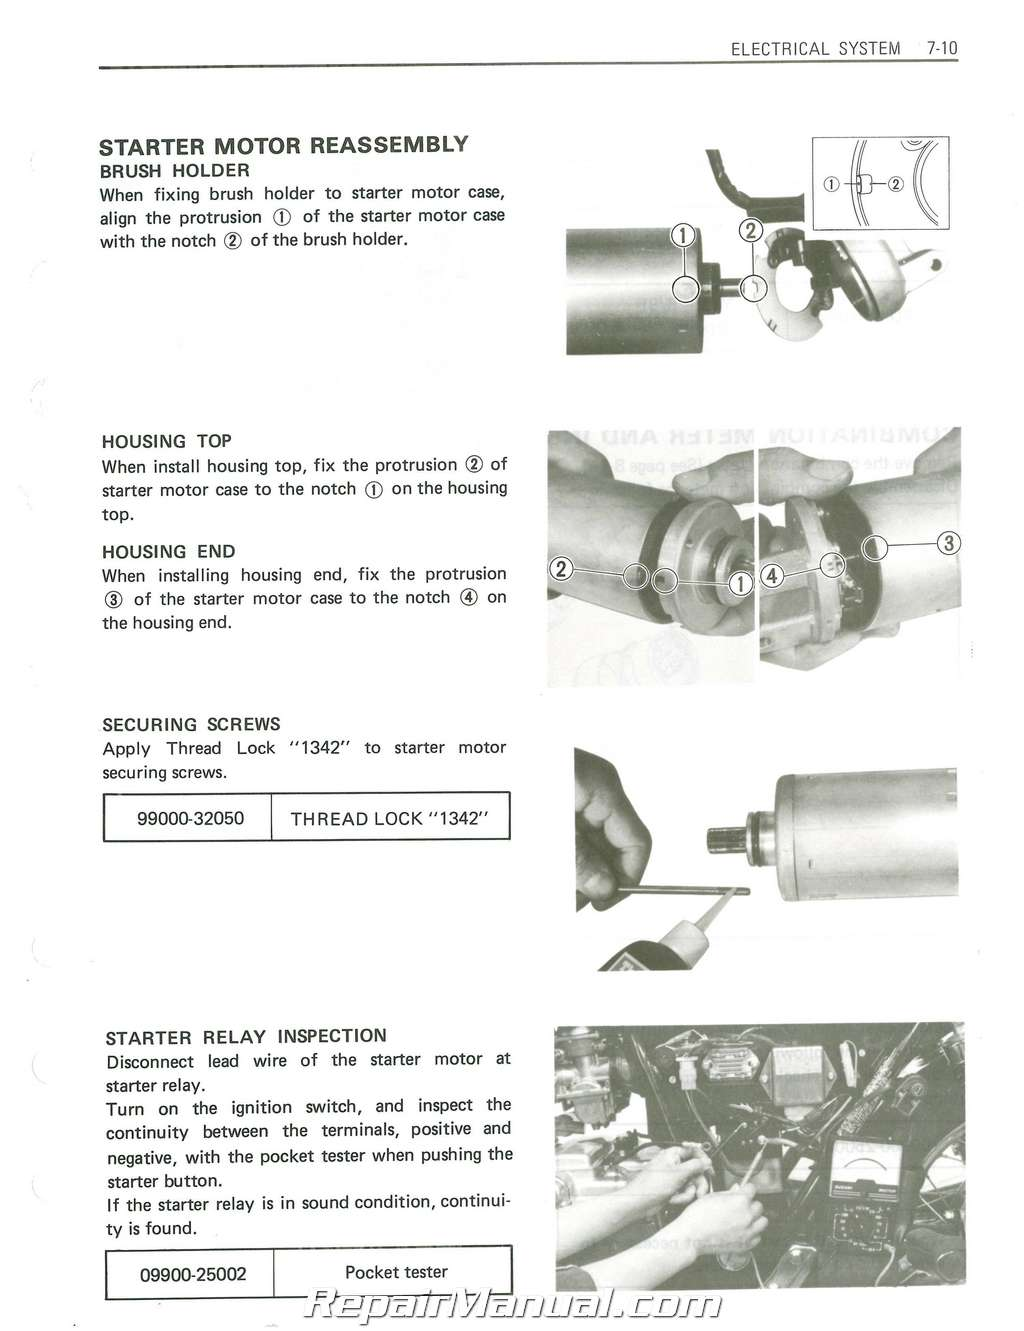 suzuki gs450 manual